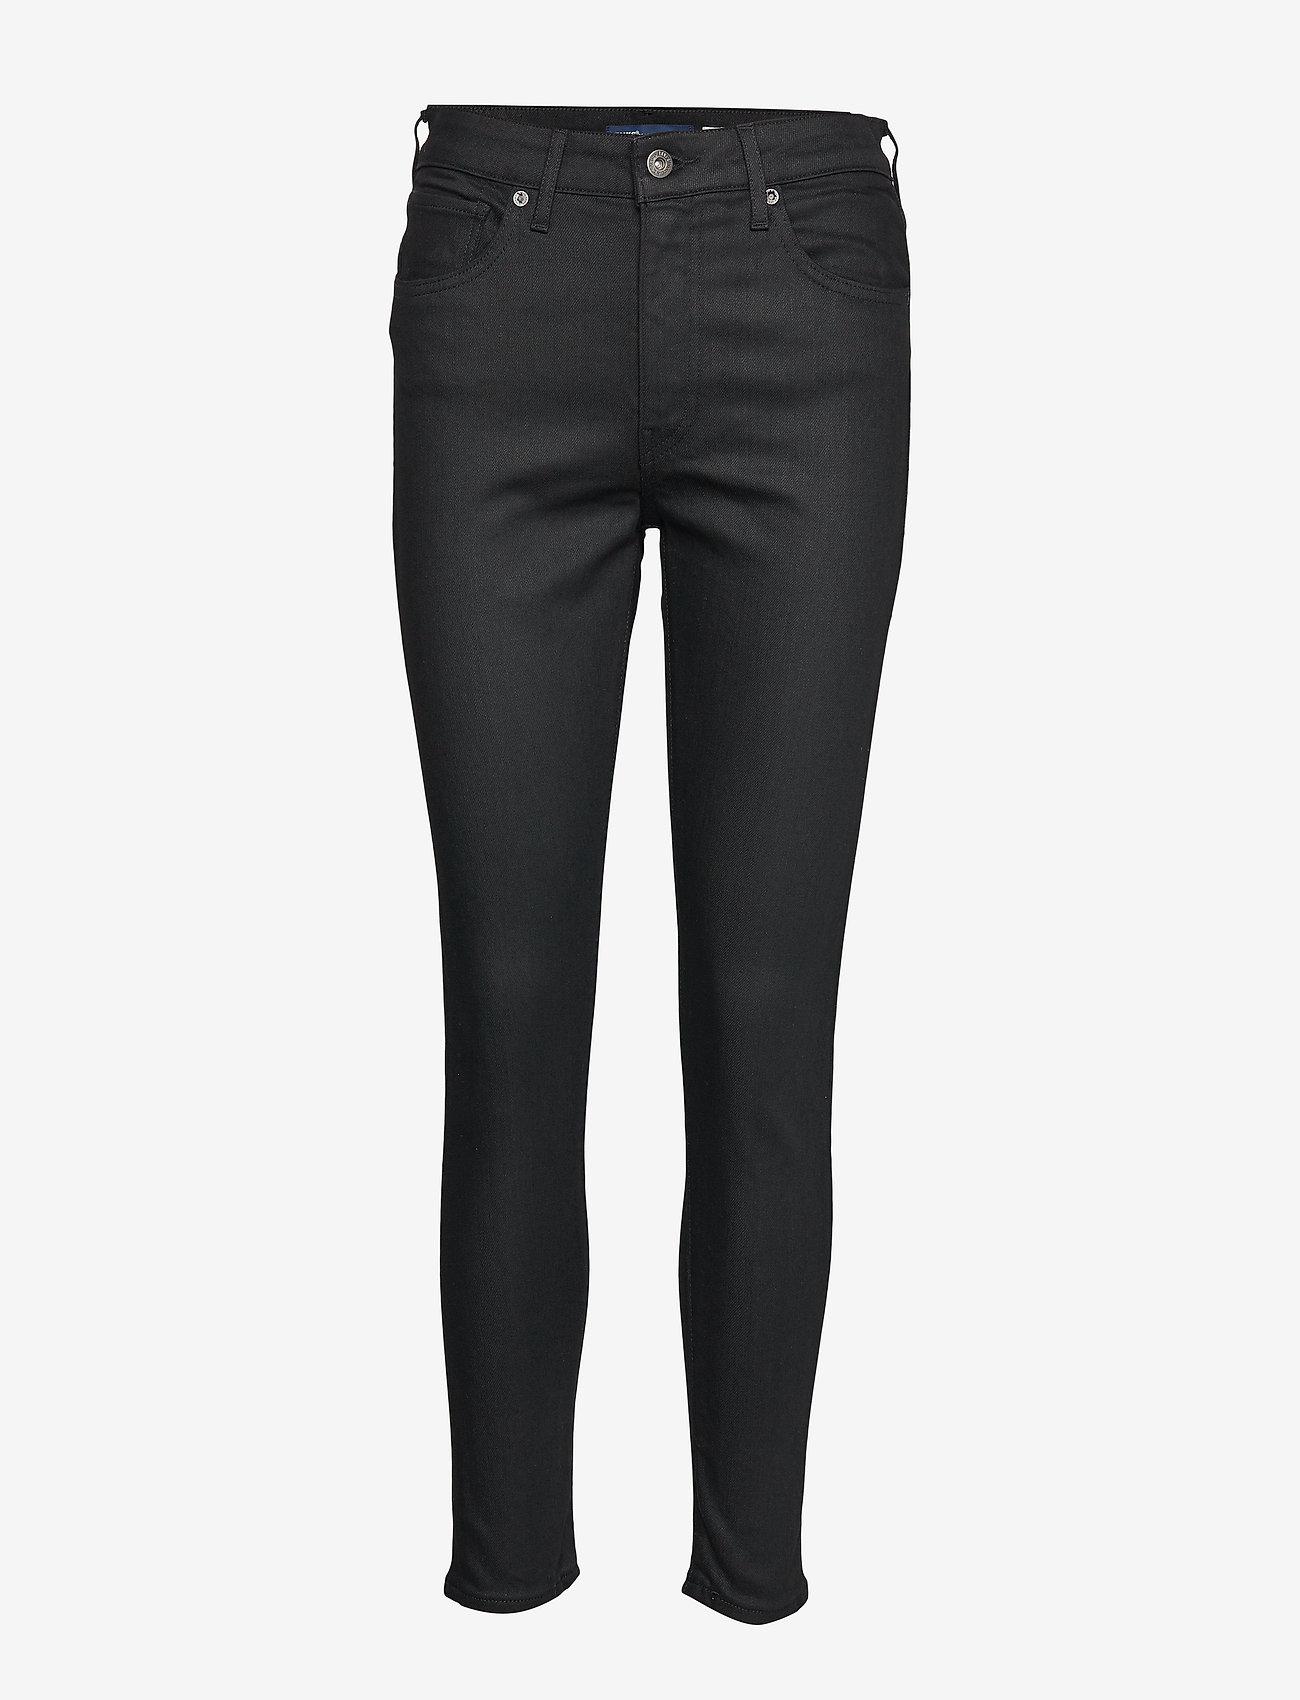 Levi's Made & Crafted - LMC 721 LMC STAY BLACK - skinny jeans - blacks